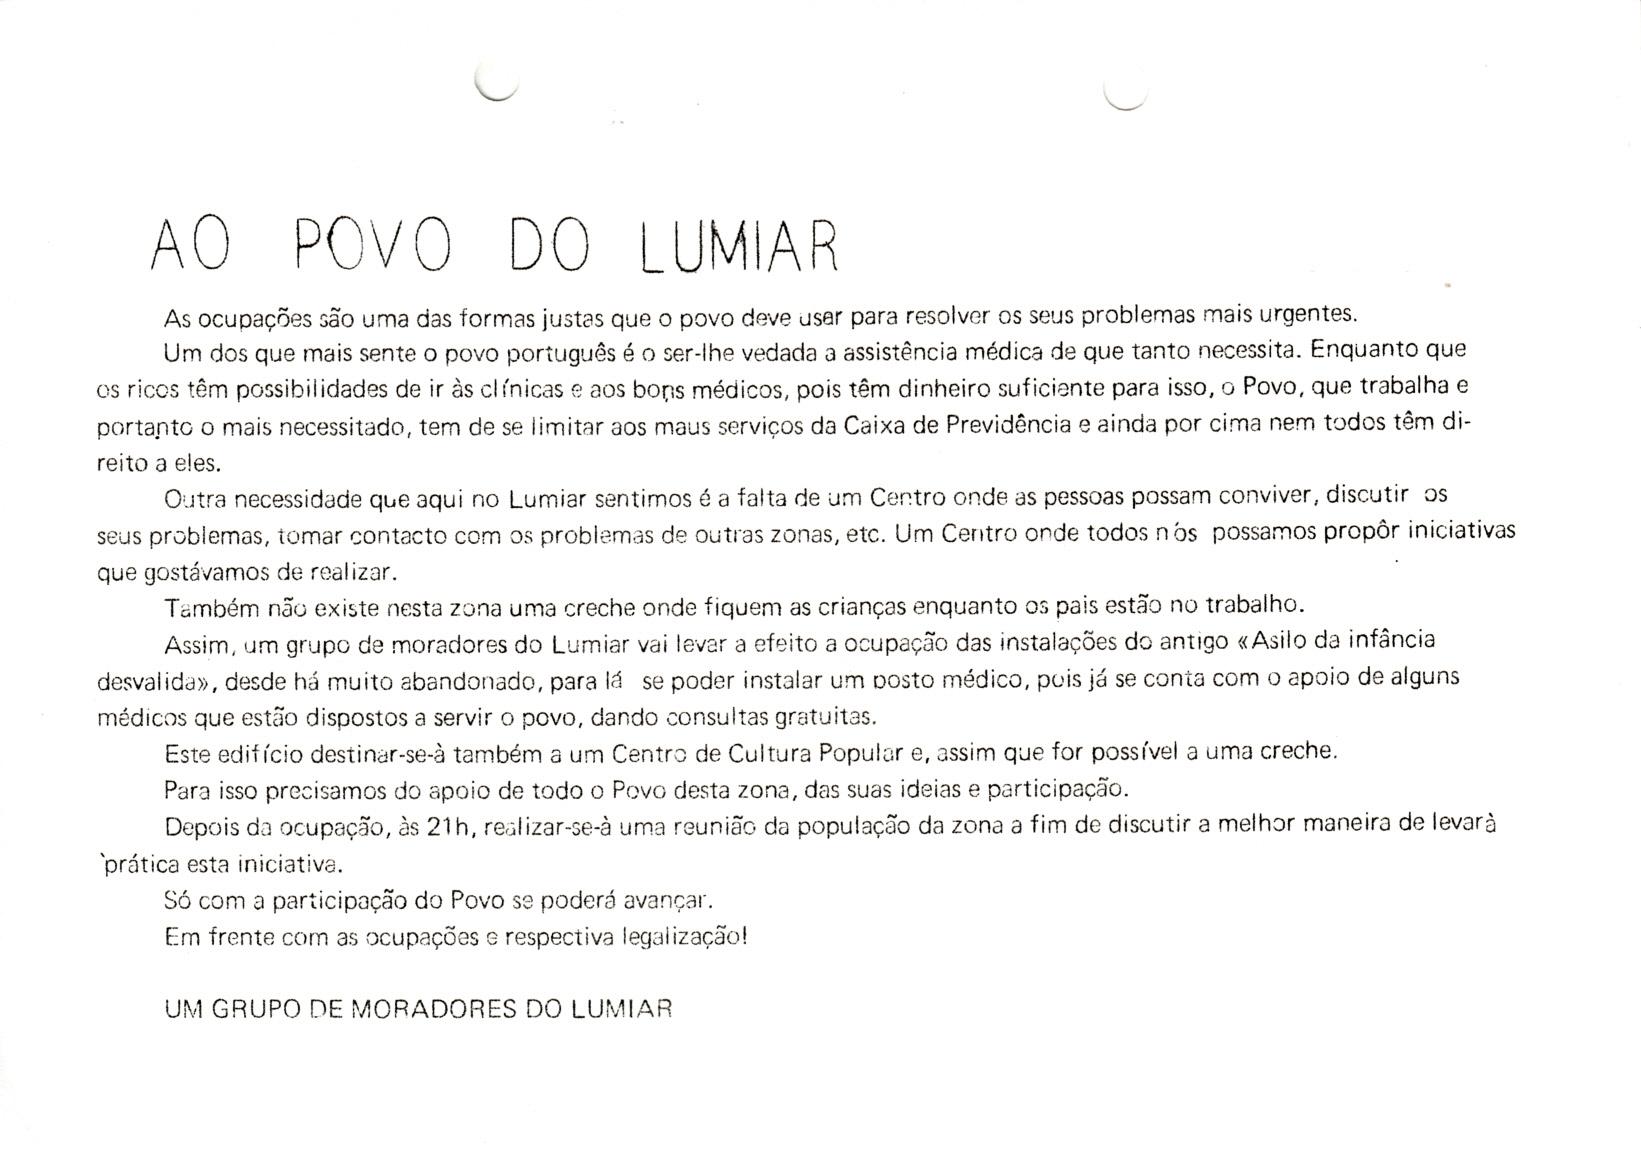 Centro_Cultura_Popular_Lumiar